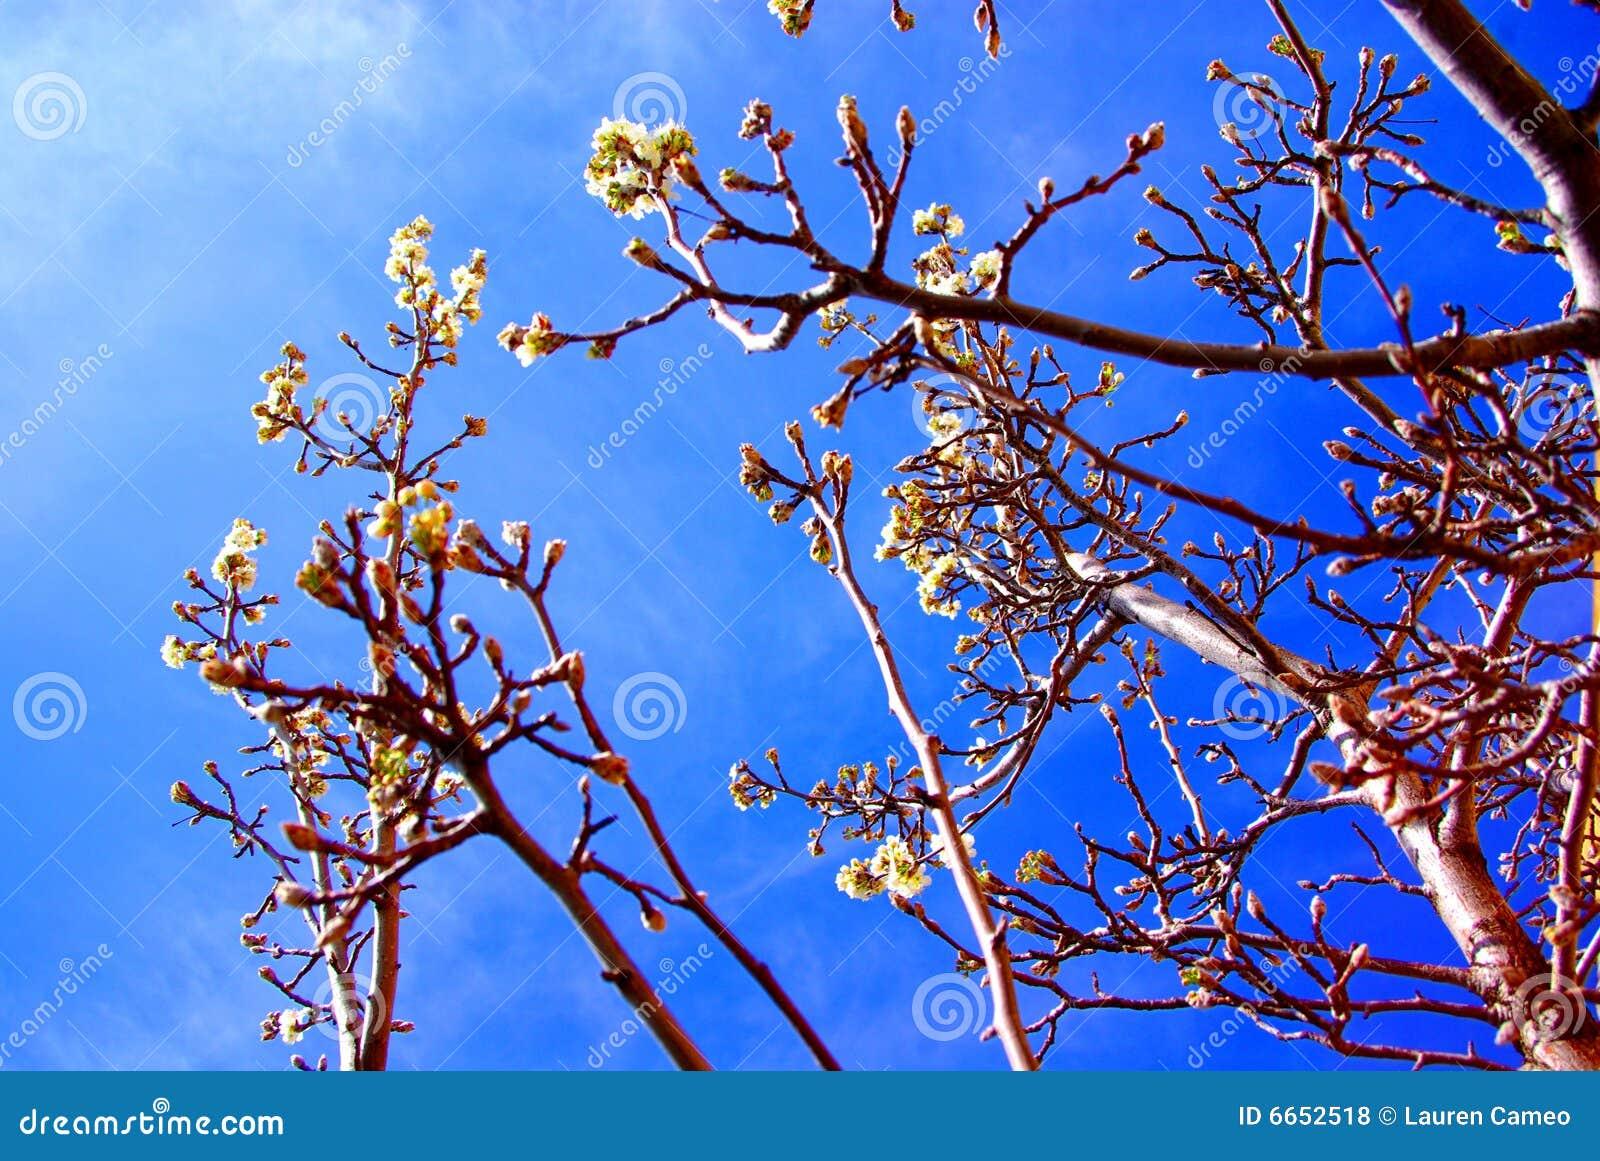 Flores na árvore na mola